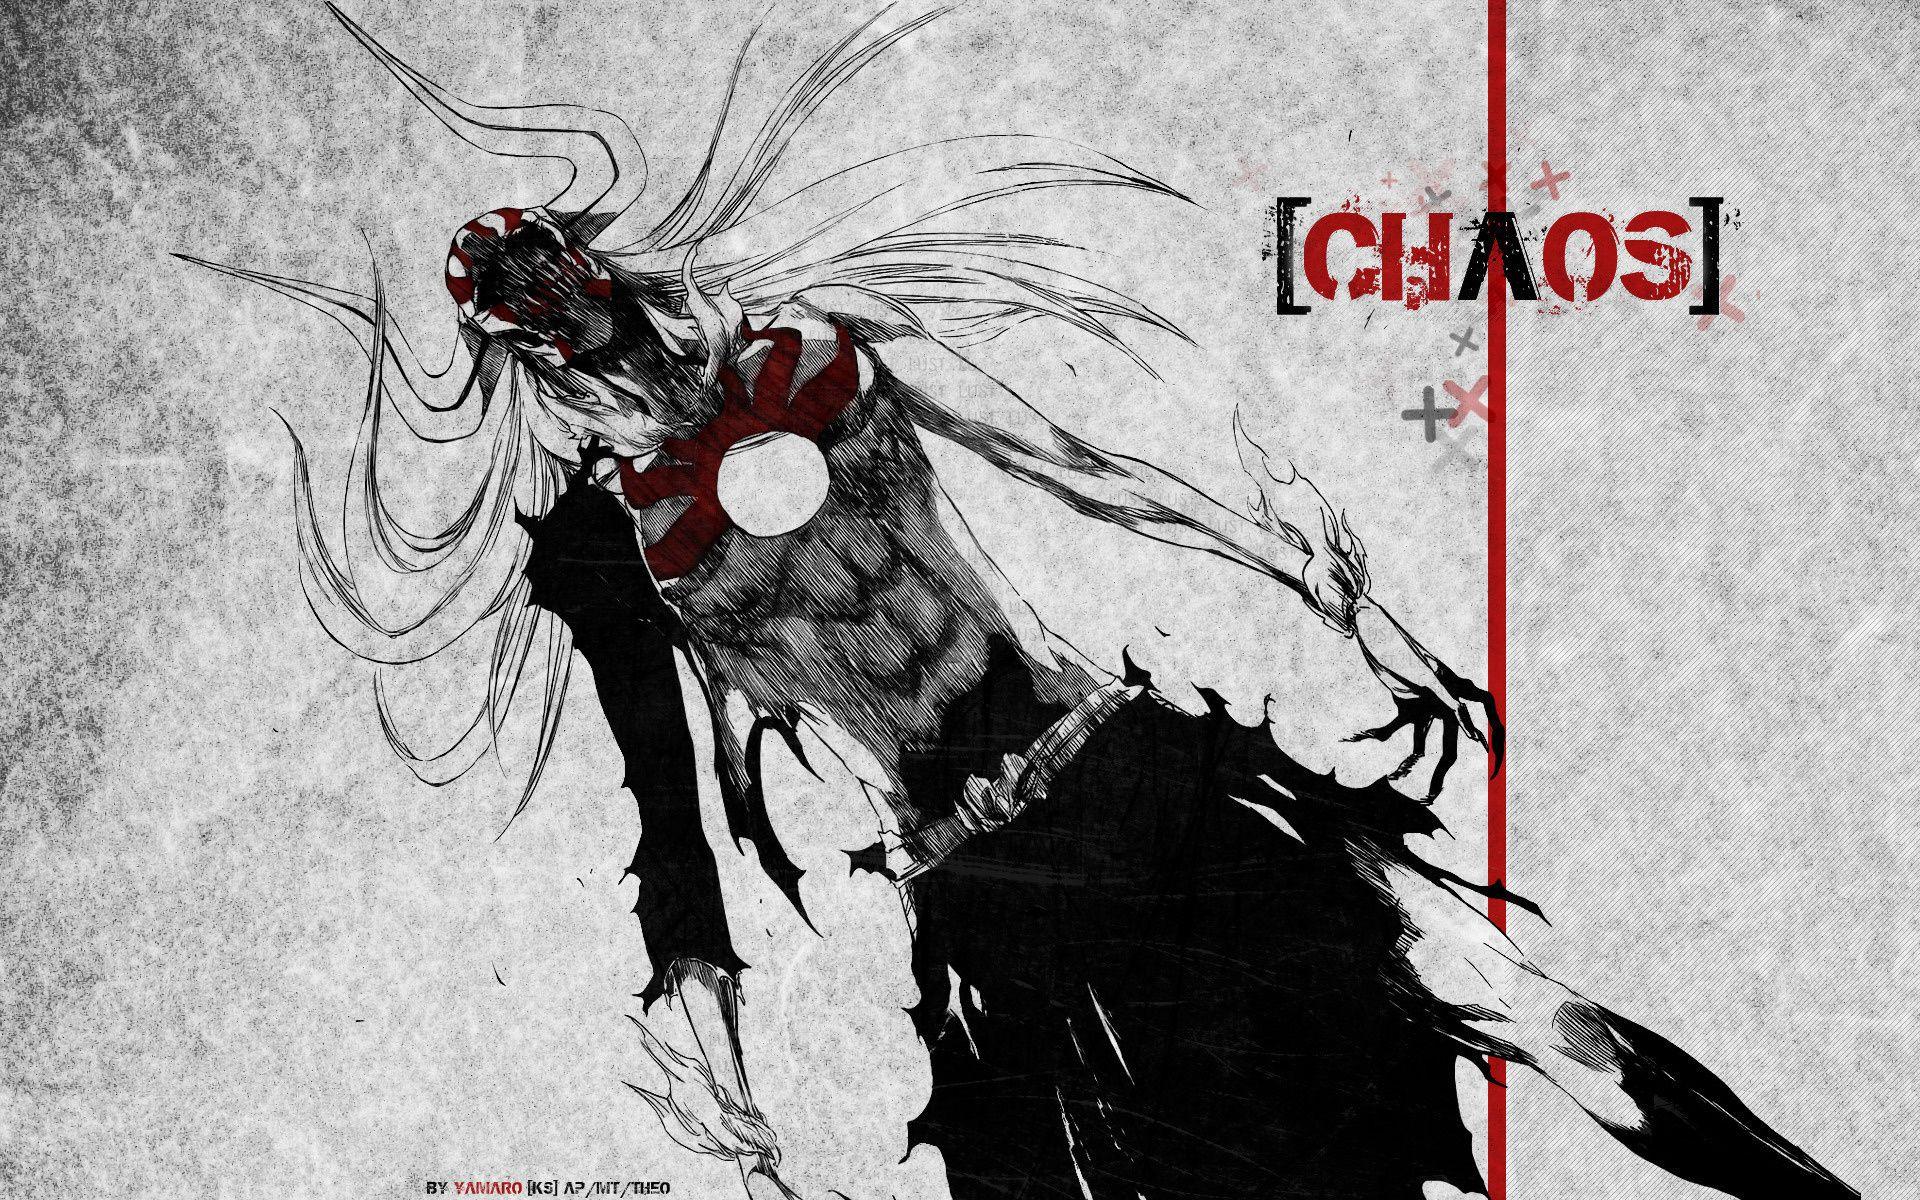 Kurosaki Ichigo Bleach Anime wallpaper | ogichi | Pinterest